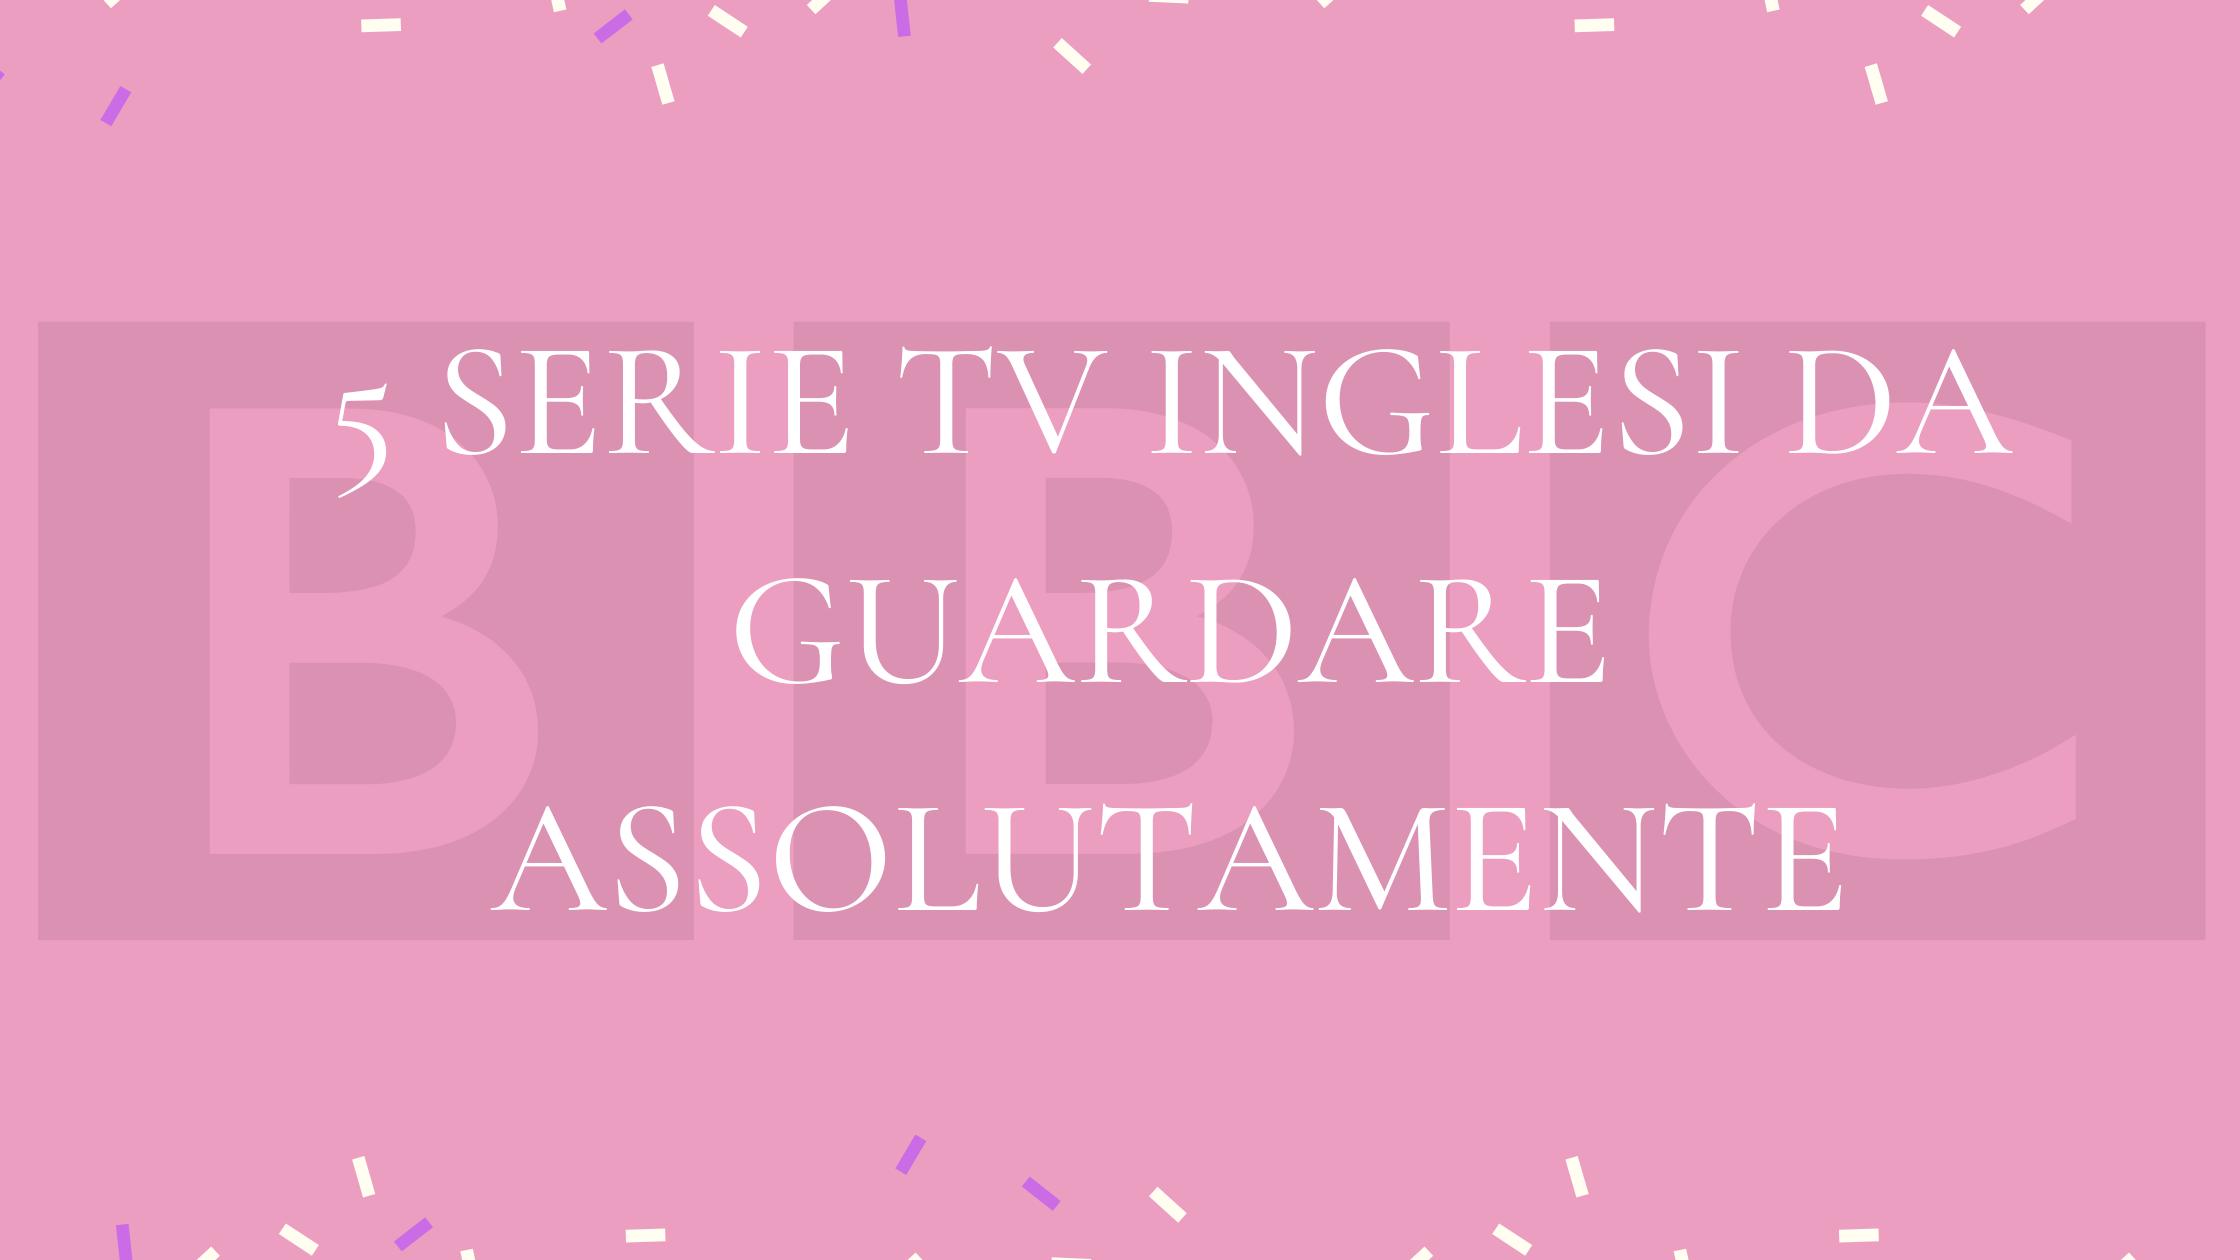 5 SERIE TV INGLESI DA GUARDARE ASSOLUTAMENTE